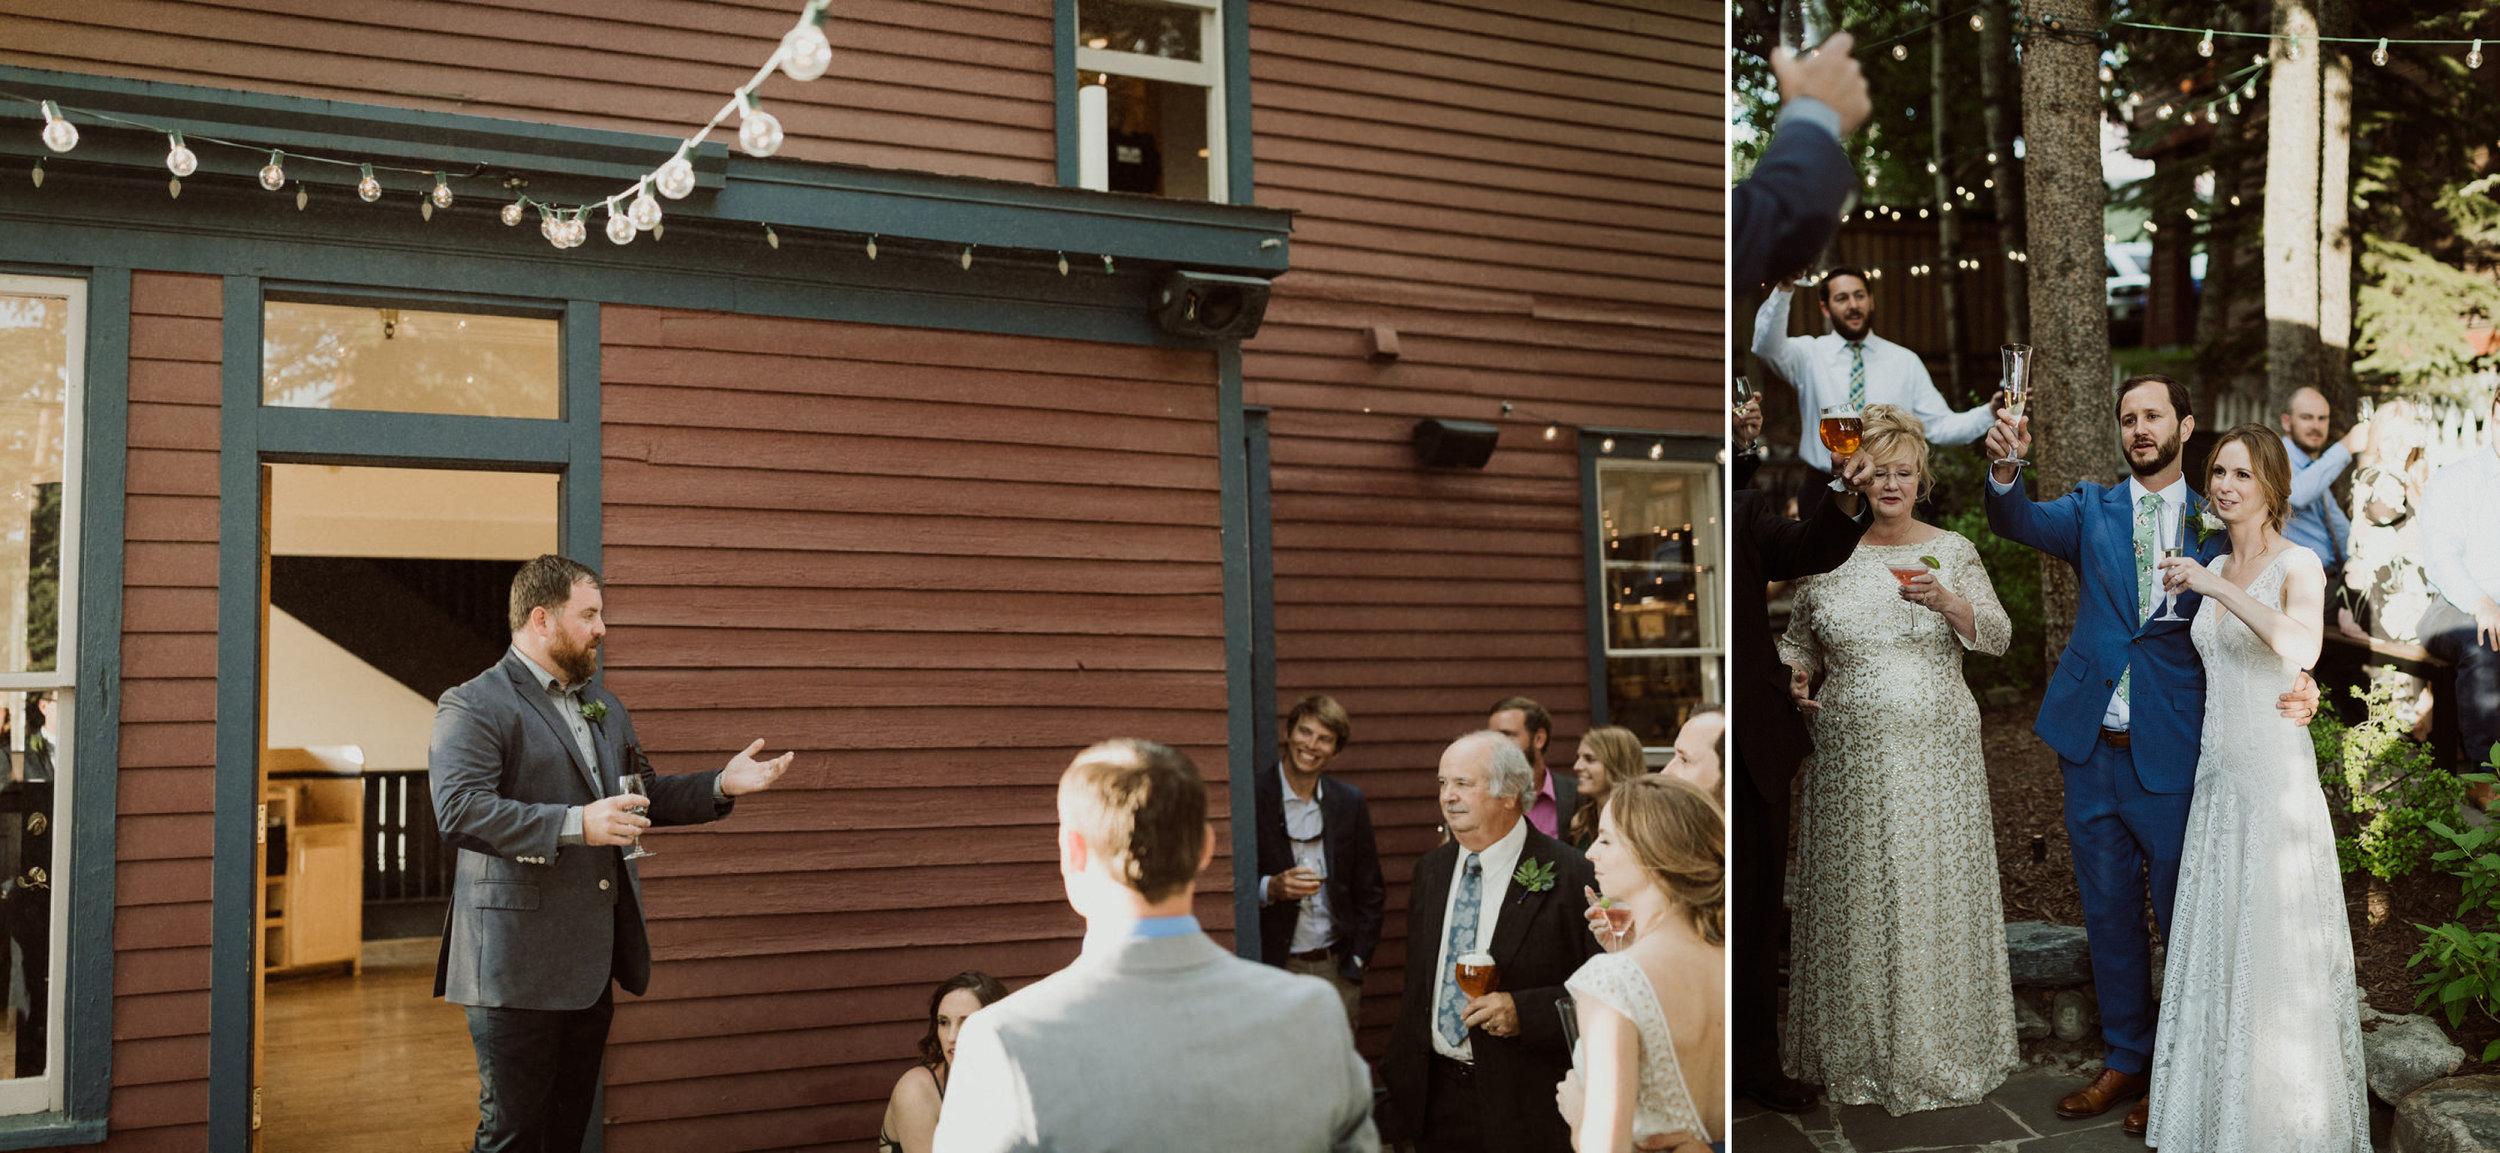 bohemian-backyard-wedding-breckenridge-colorado-173.jpg